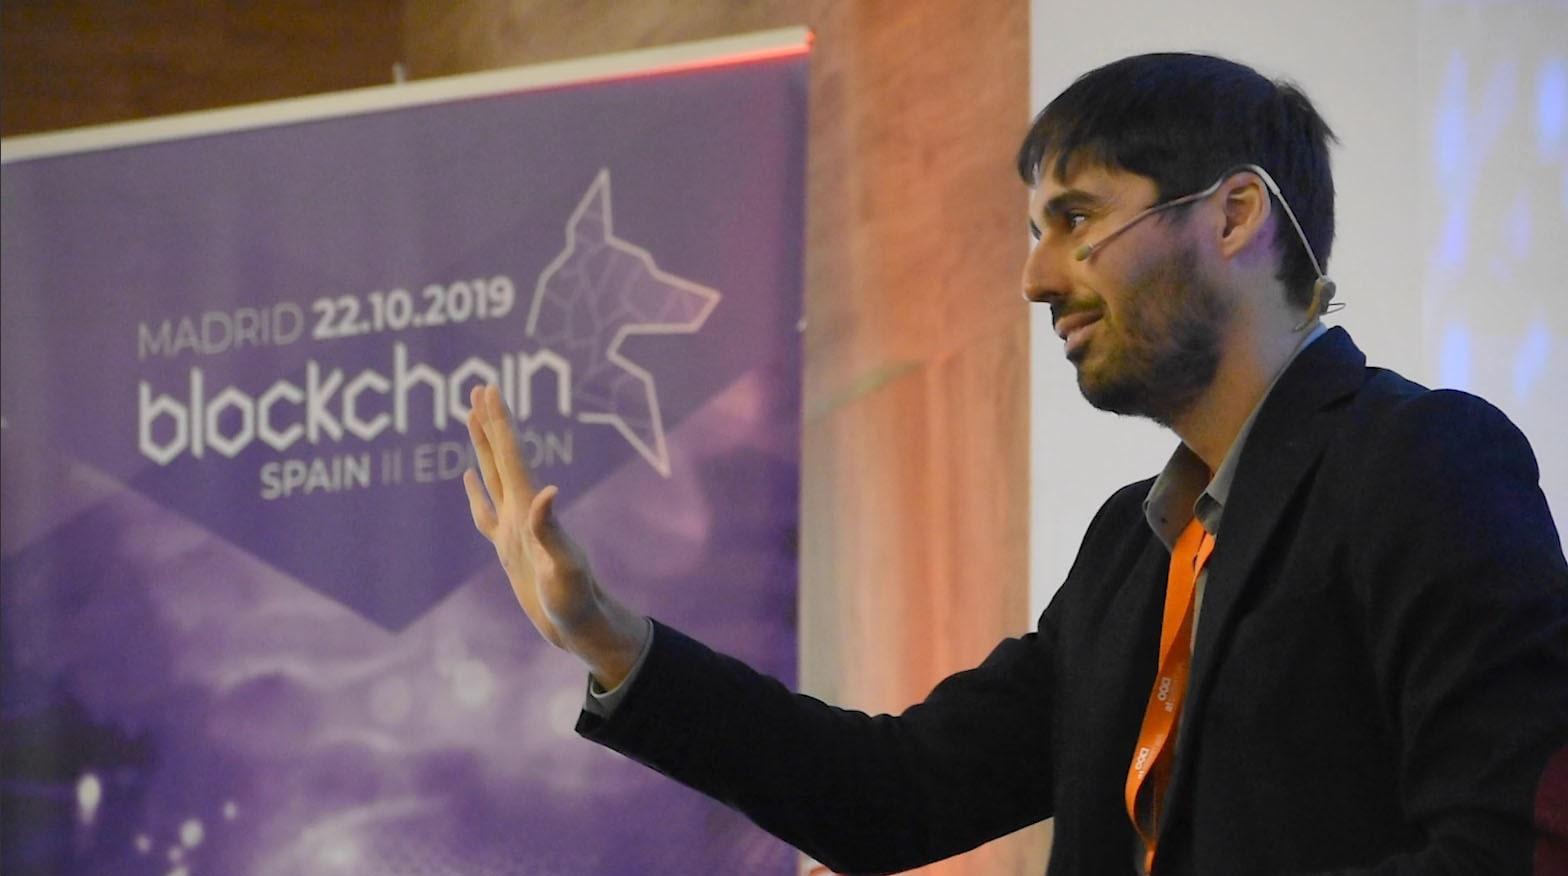 Blockchain Spain 2019 (1)